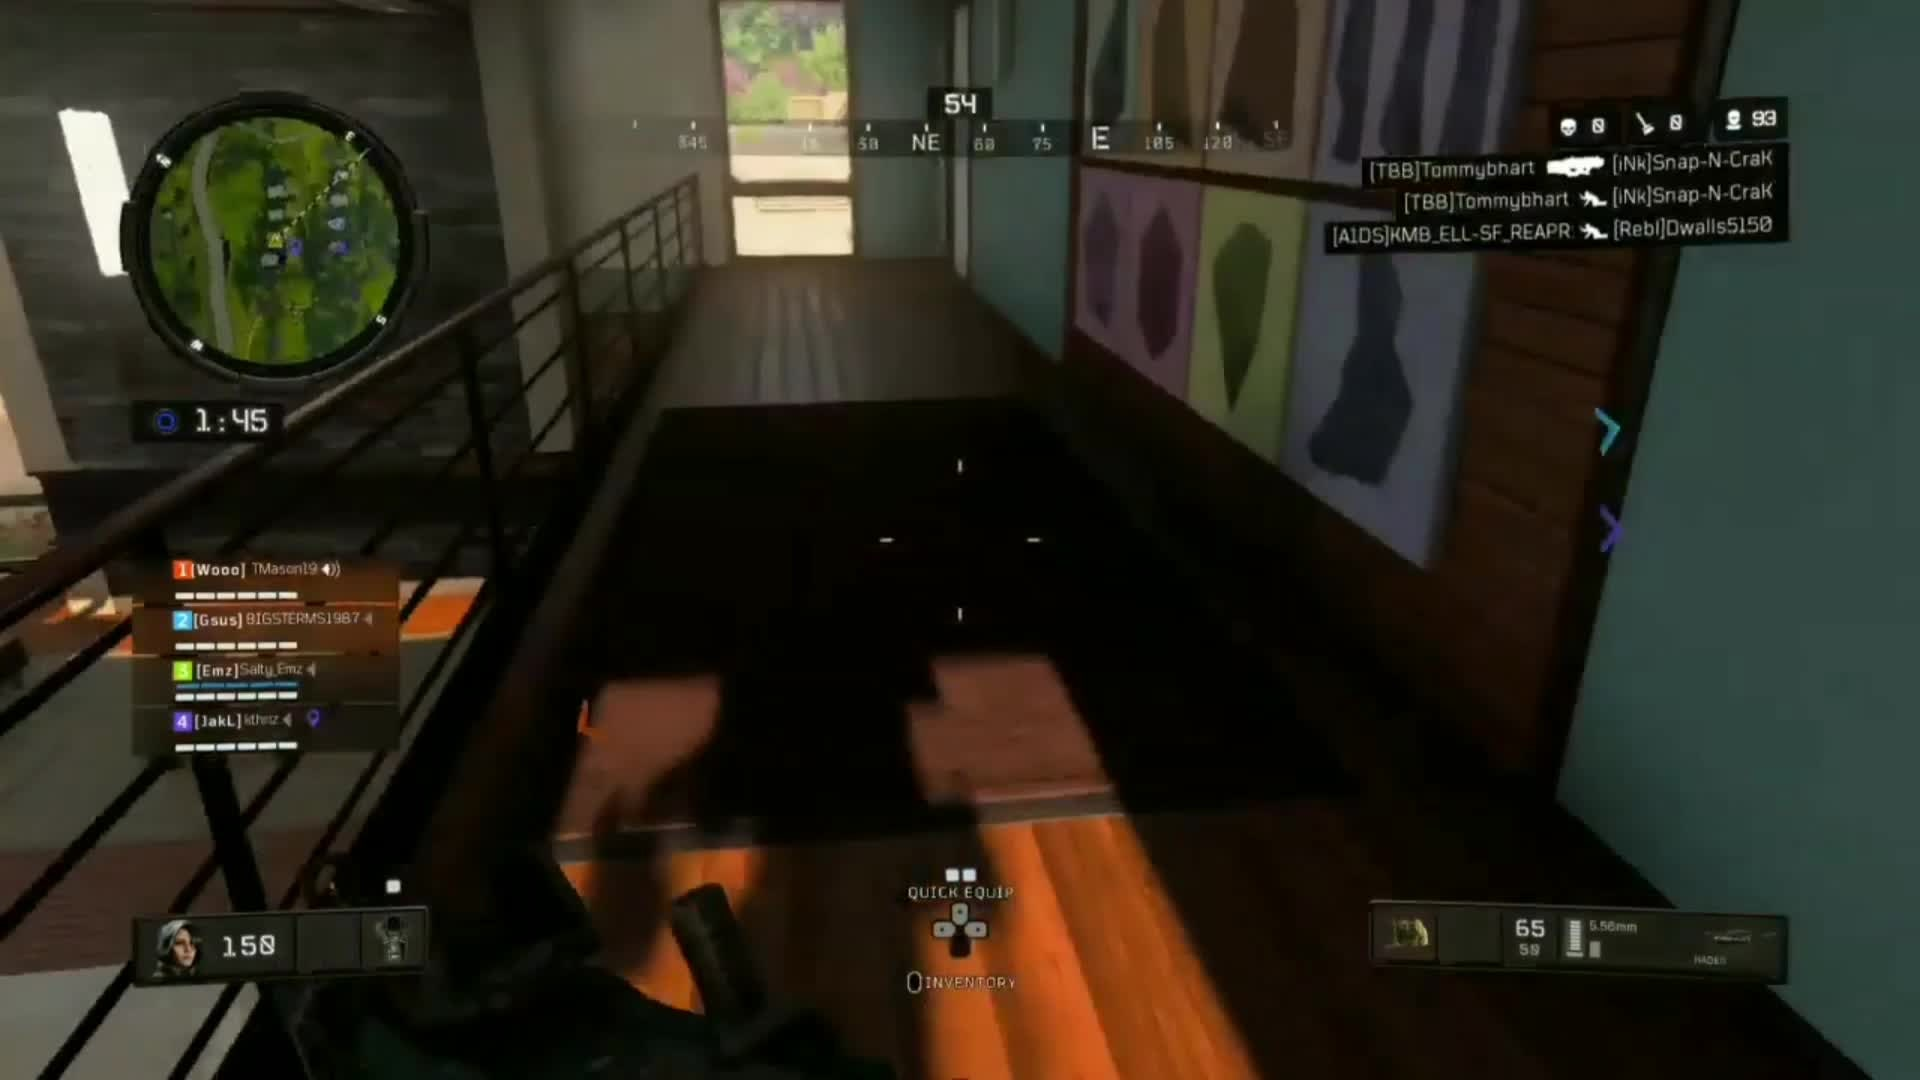 Call of Duty: General - Random kills me for no reason video cover image 1